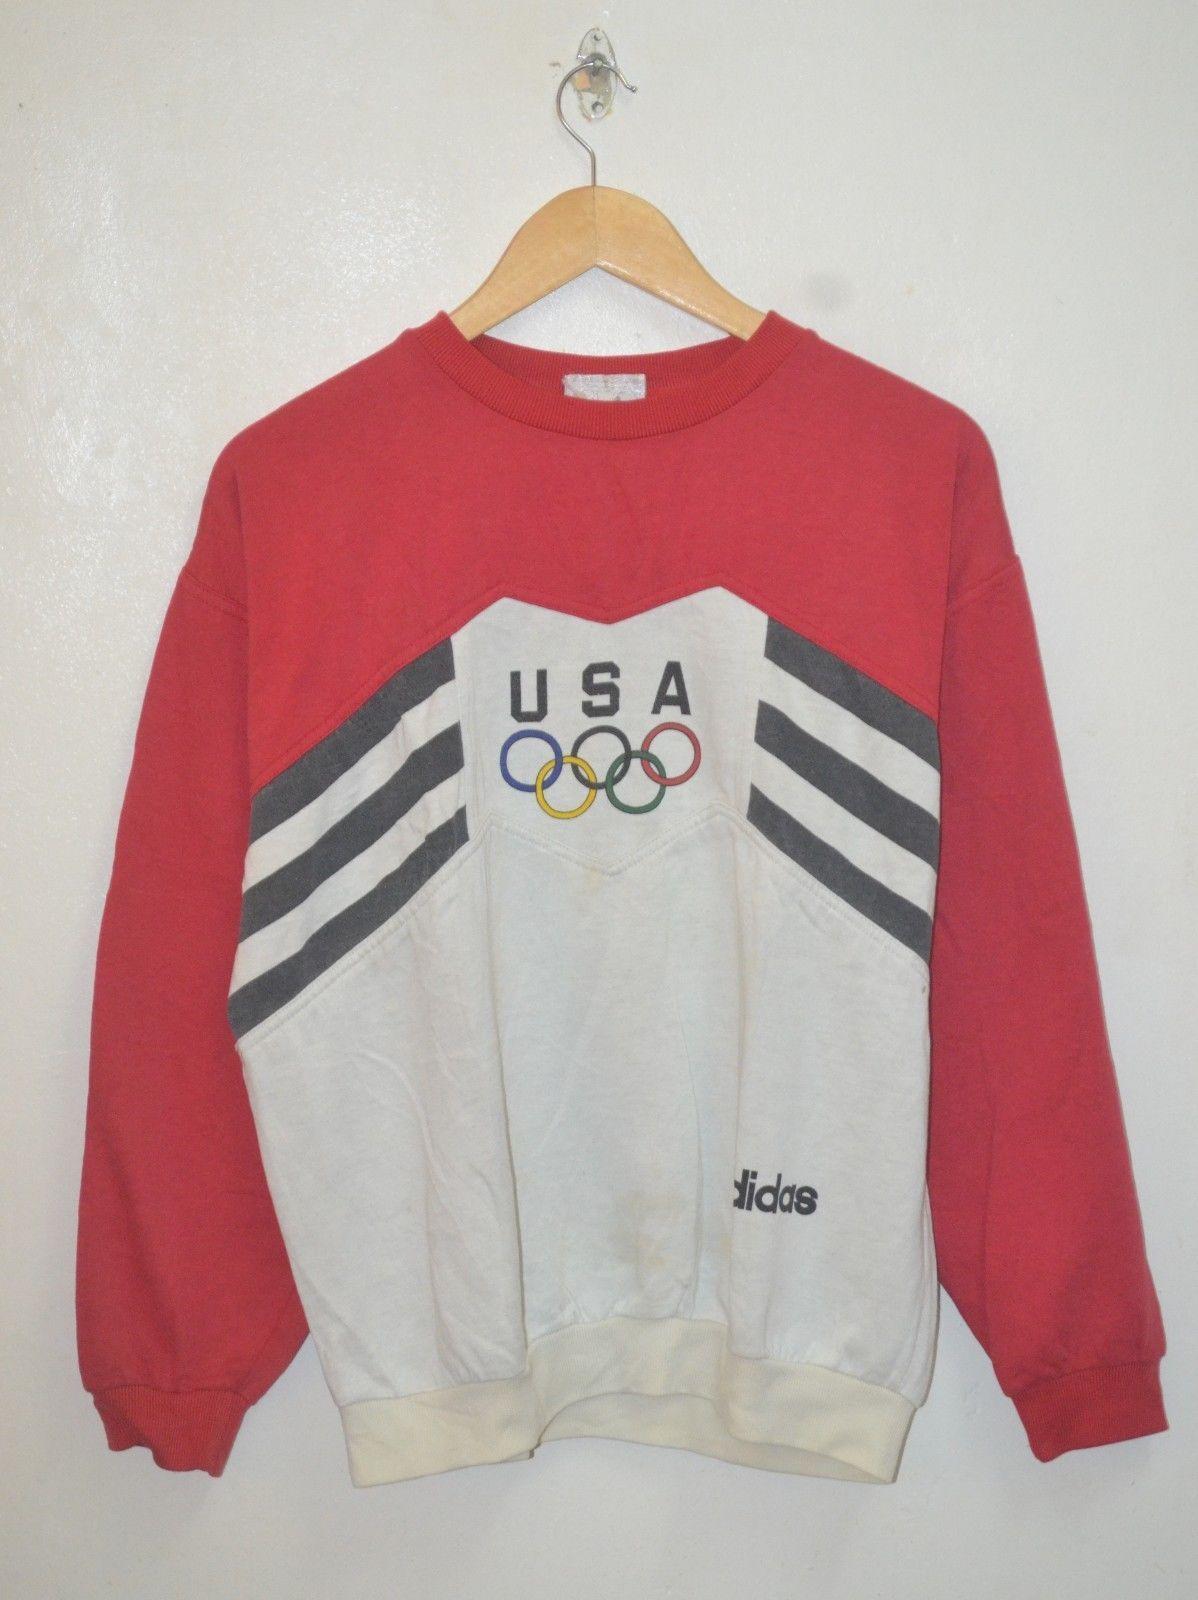 VINTAGE RARE ADIDAS TREFOIL 80s 90s RUN DMC OLYMPIC SWEATSHIRT